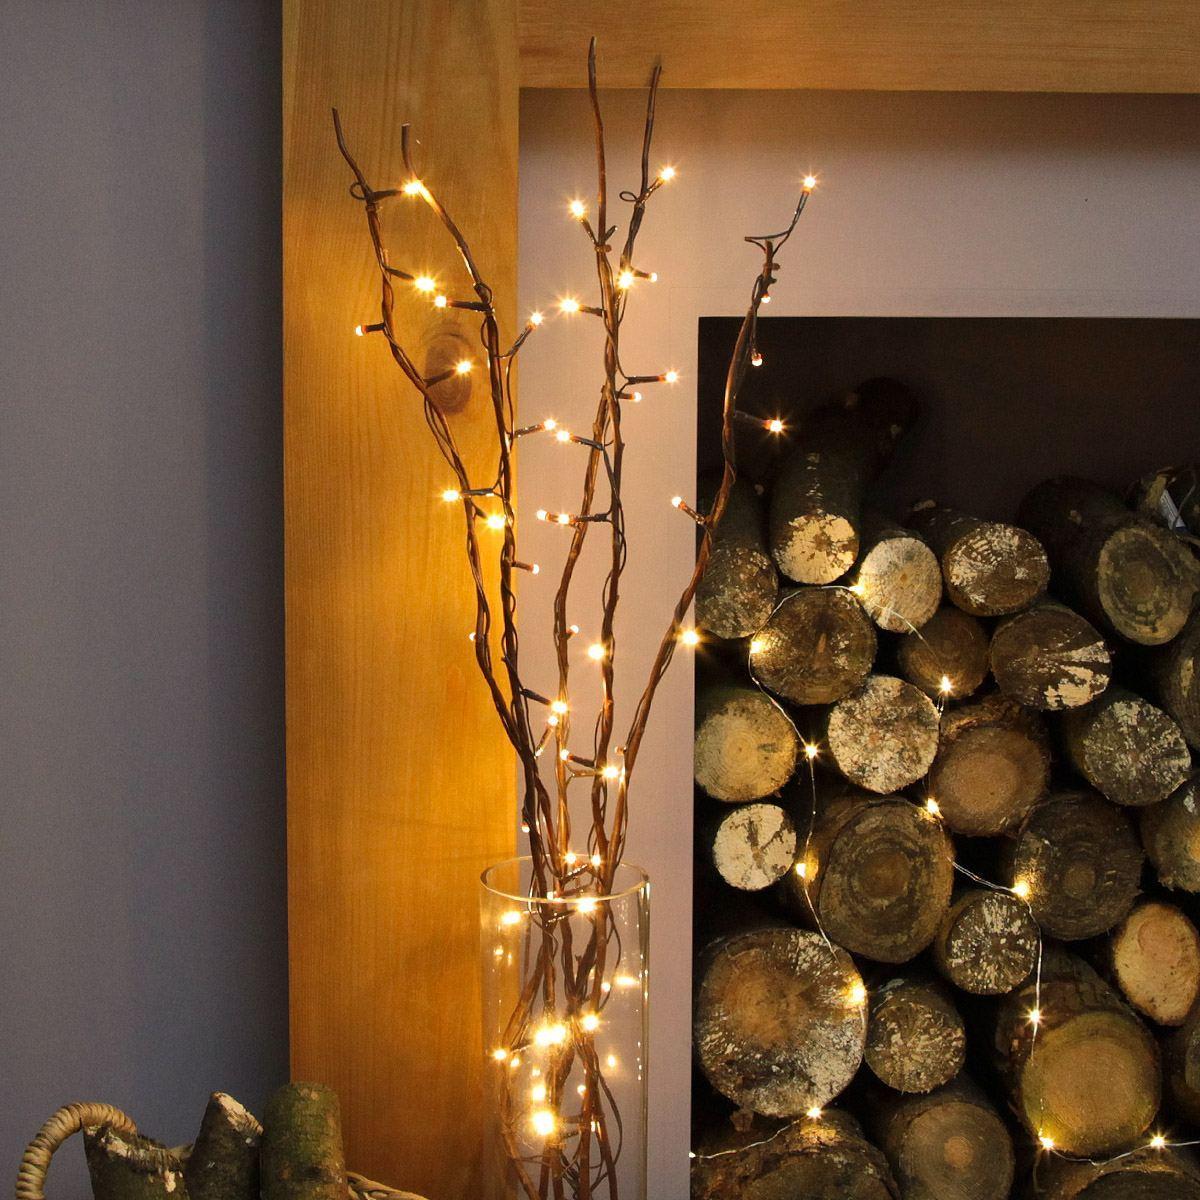 5 Decorative Willow Twig Lights 50 Warm White Leds 87cm